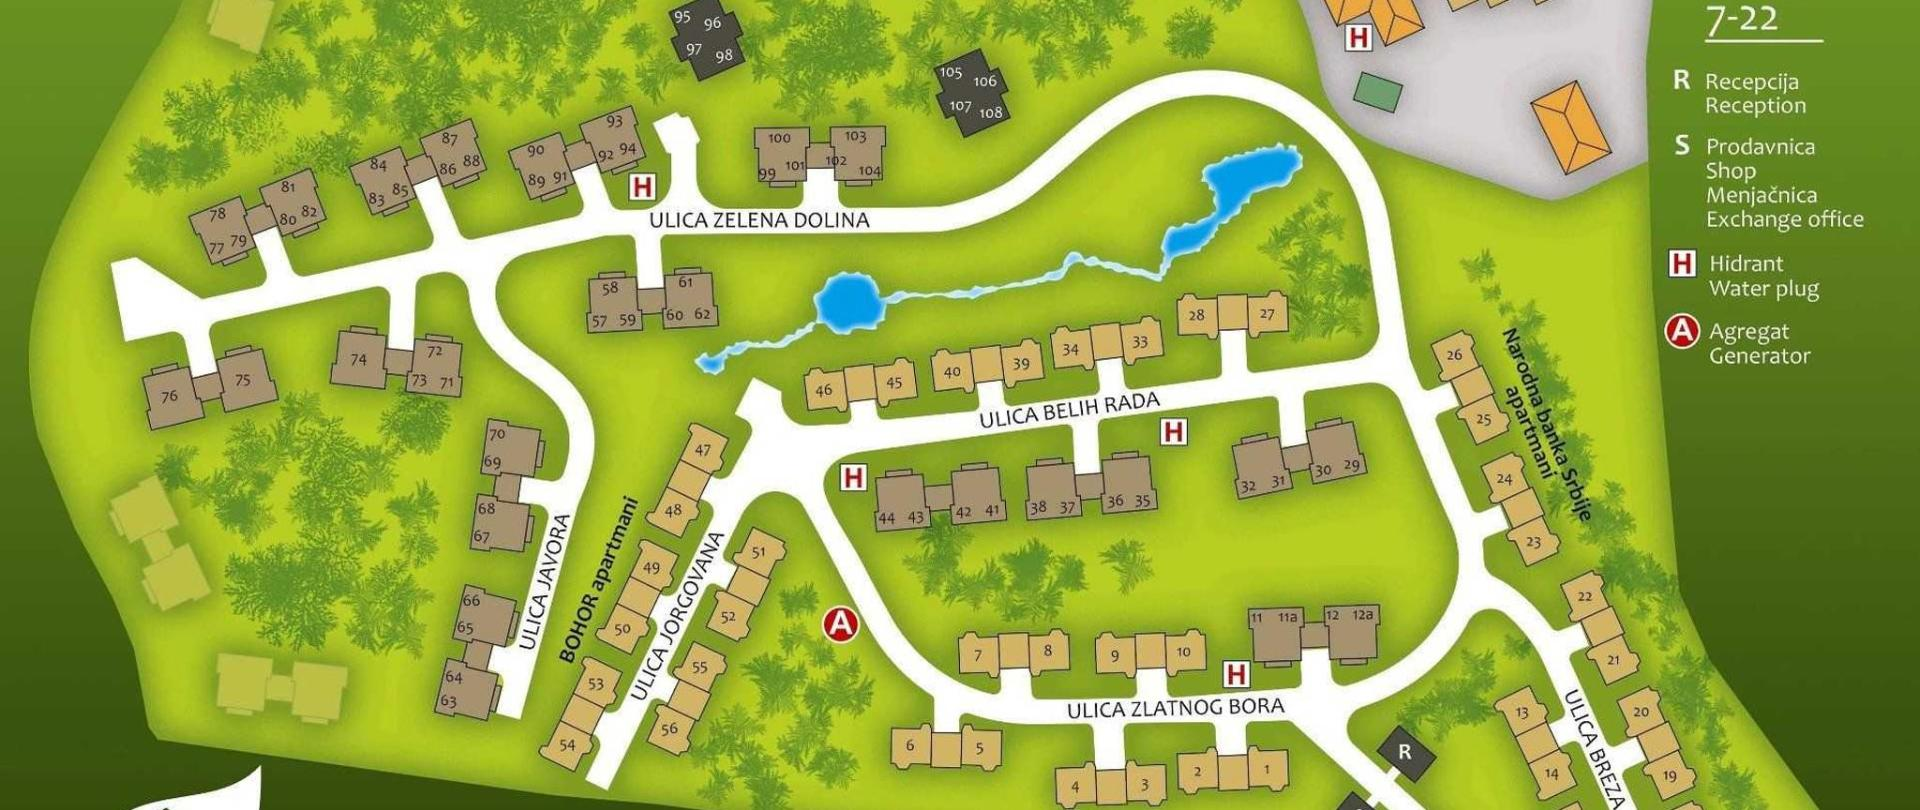 mapa-kraljevi-konaci.jpg